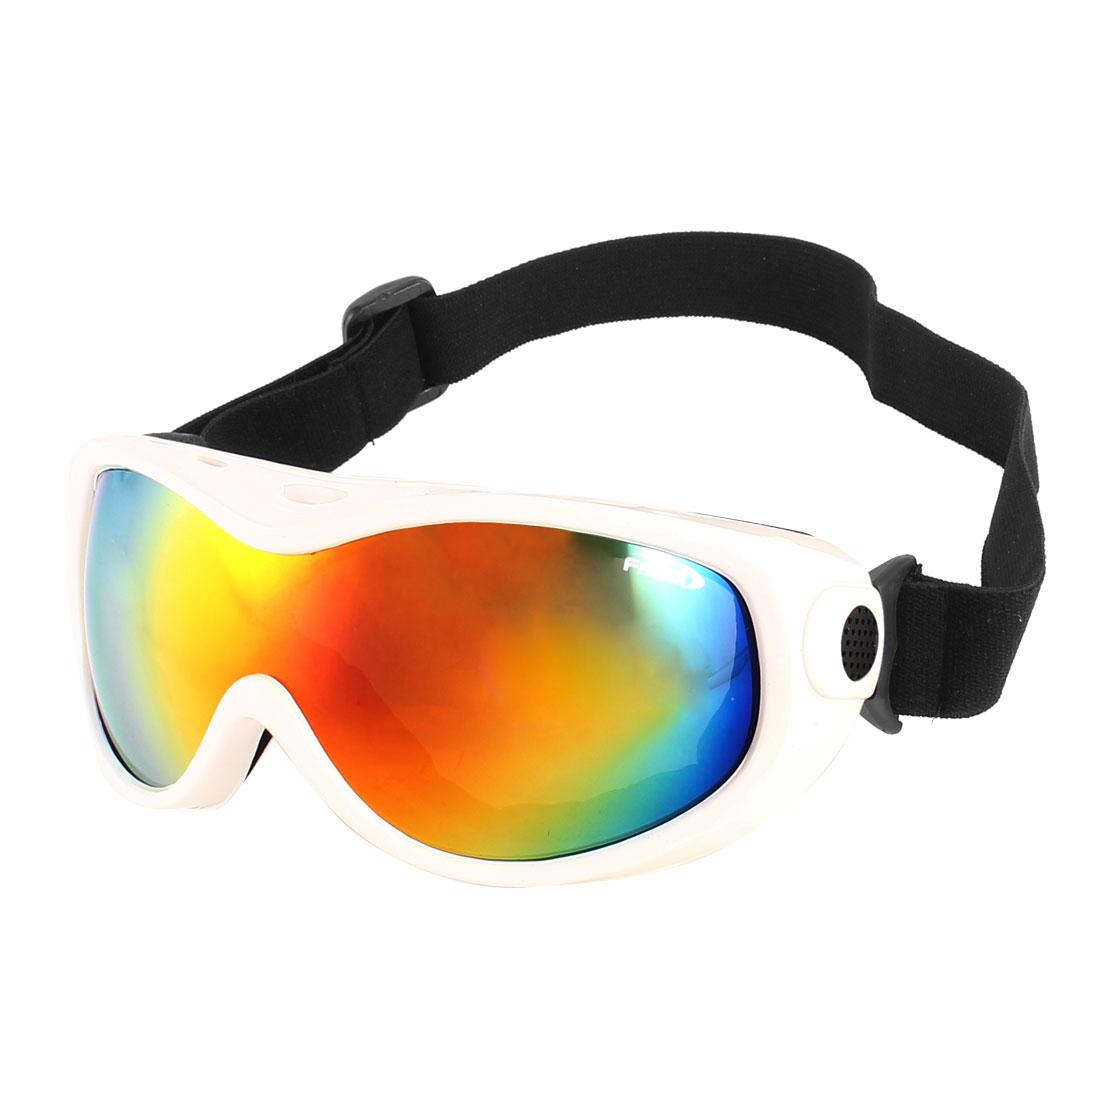 Lady Man Wide Rim Anti Fog Multicolor Lens Camping Ski Snowboard Goggles